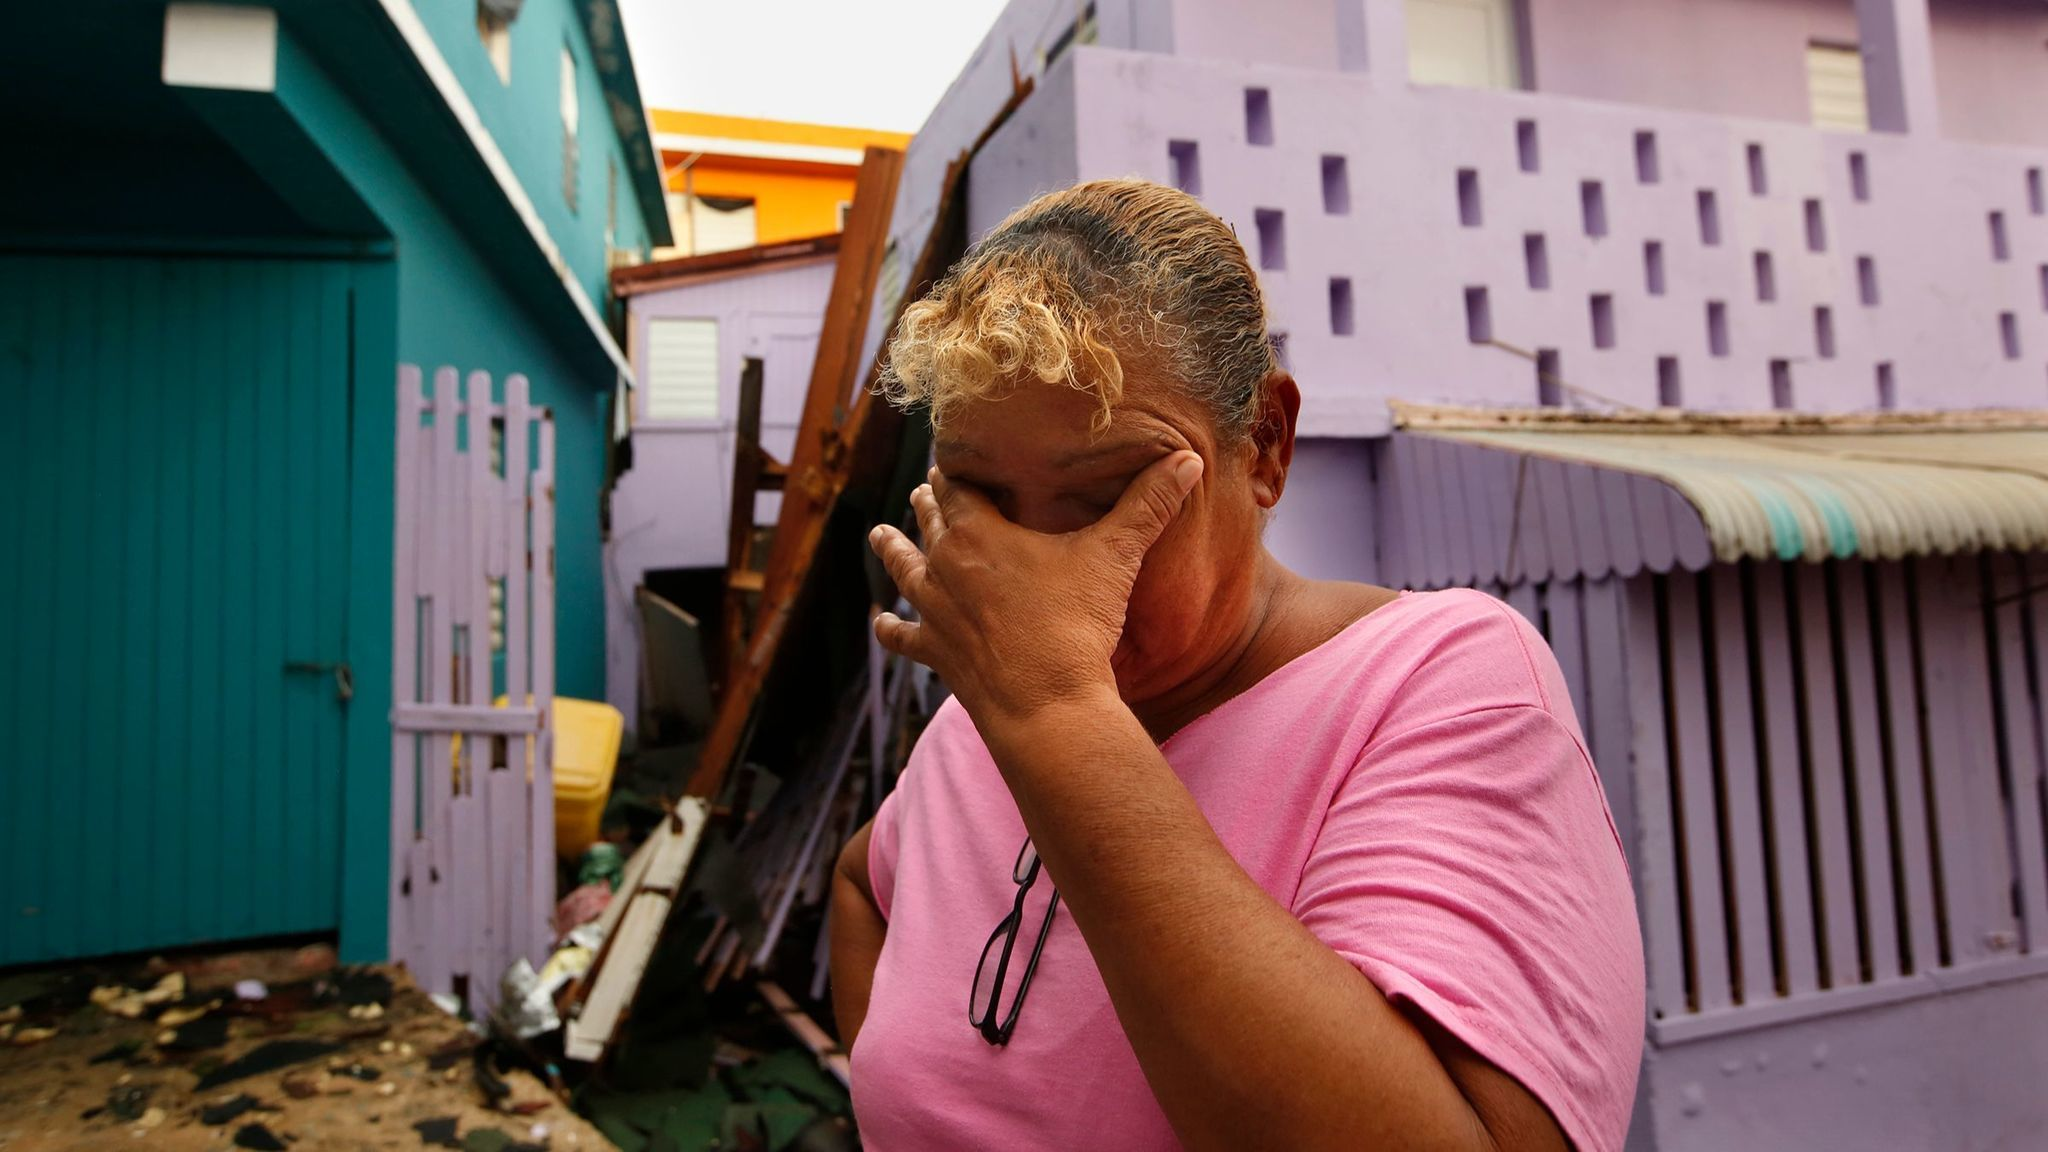 SAN JUAN, PUERTO RICO--SEPT. 21, 2017-- Sonia Viruet, 61, who lives in La Perla, Puerto Rico, takes